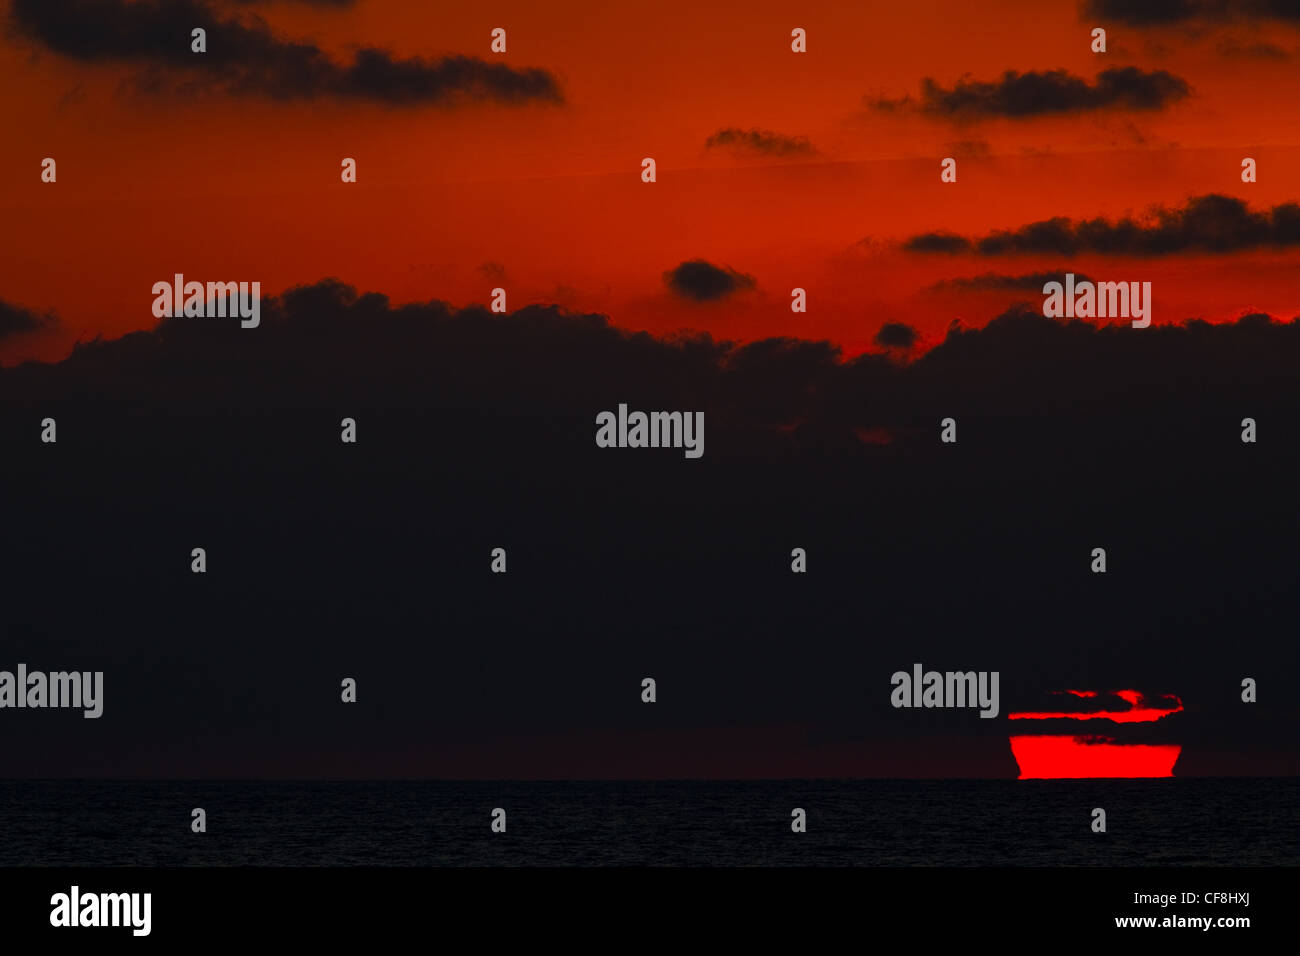 Epic sunset, Rio Nexpa, Mexico - Stock Image